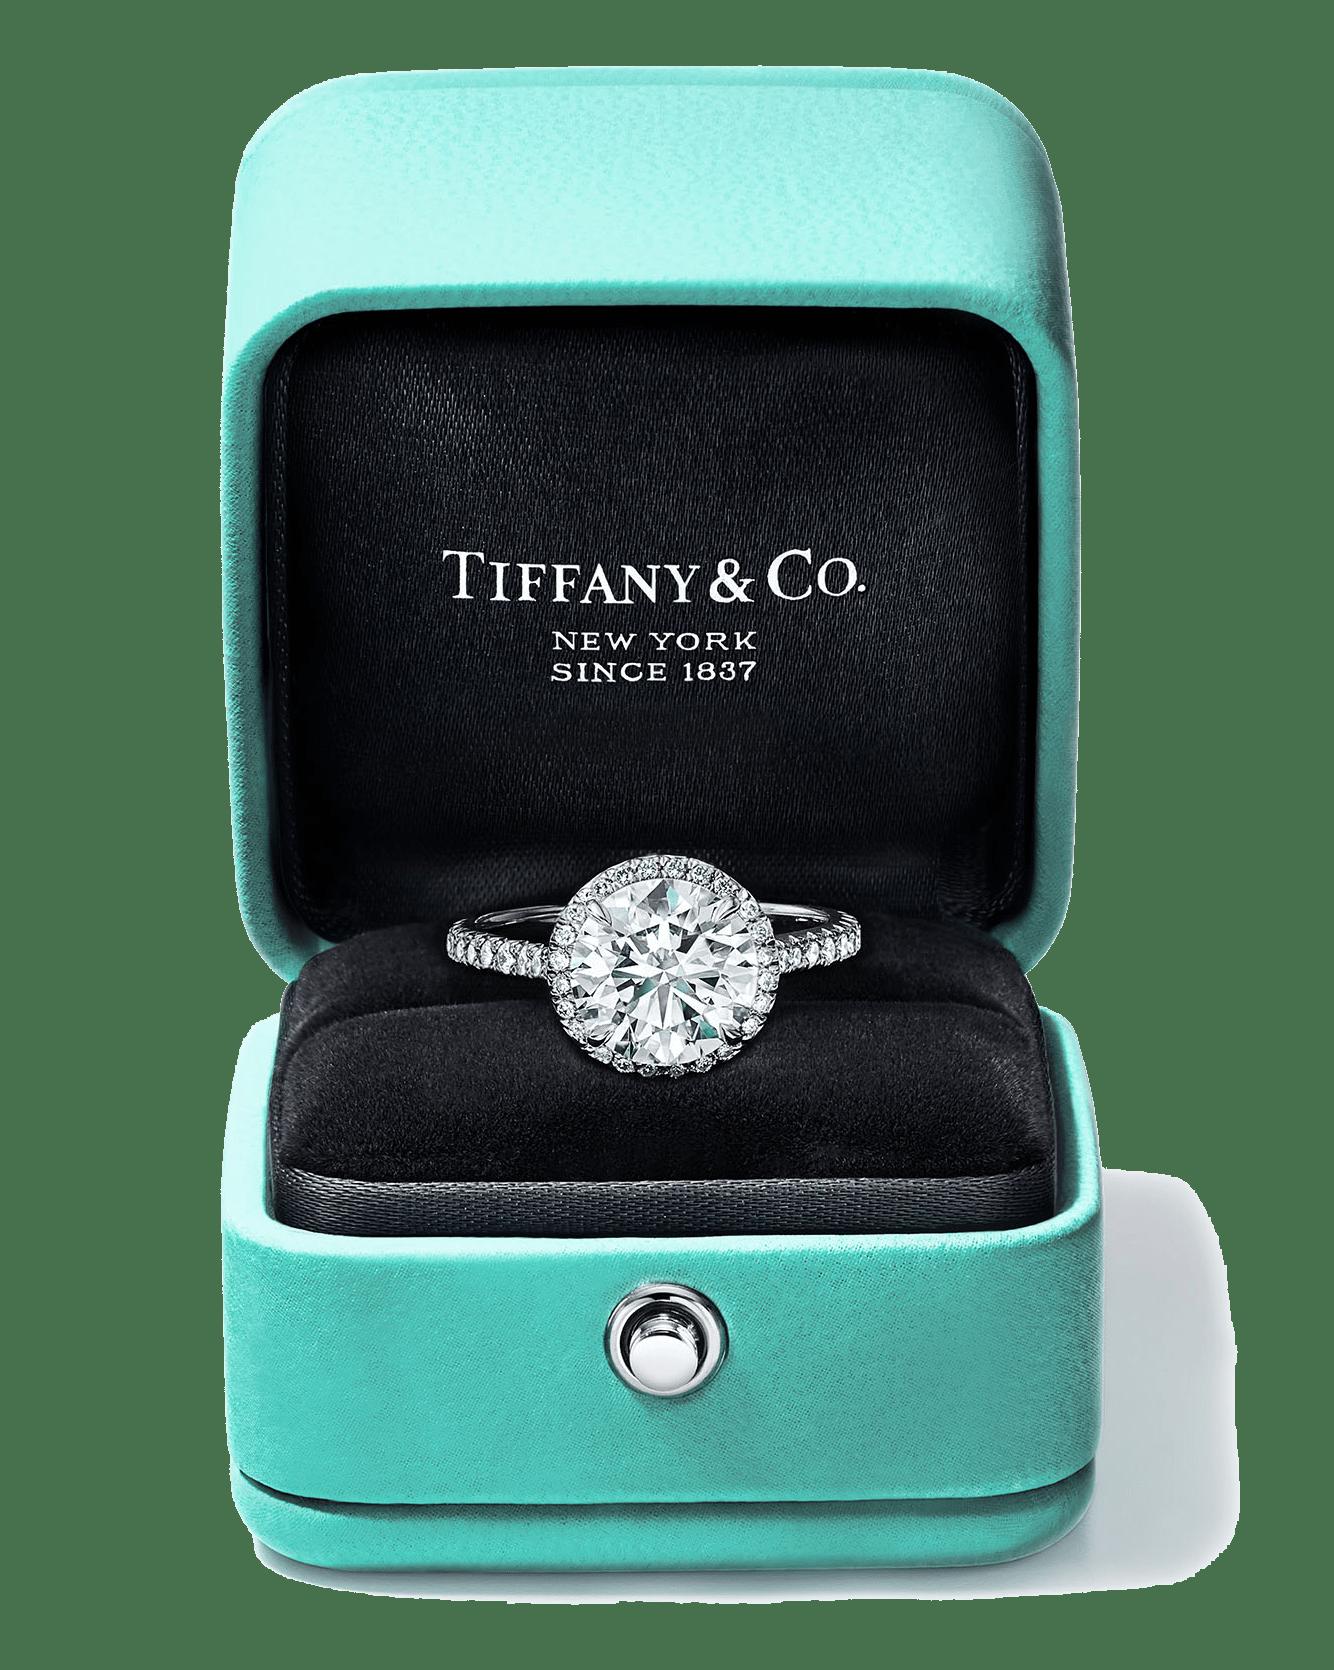 Tiffany & Co. X Daniel Tam